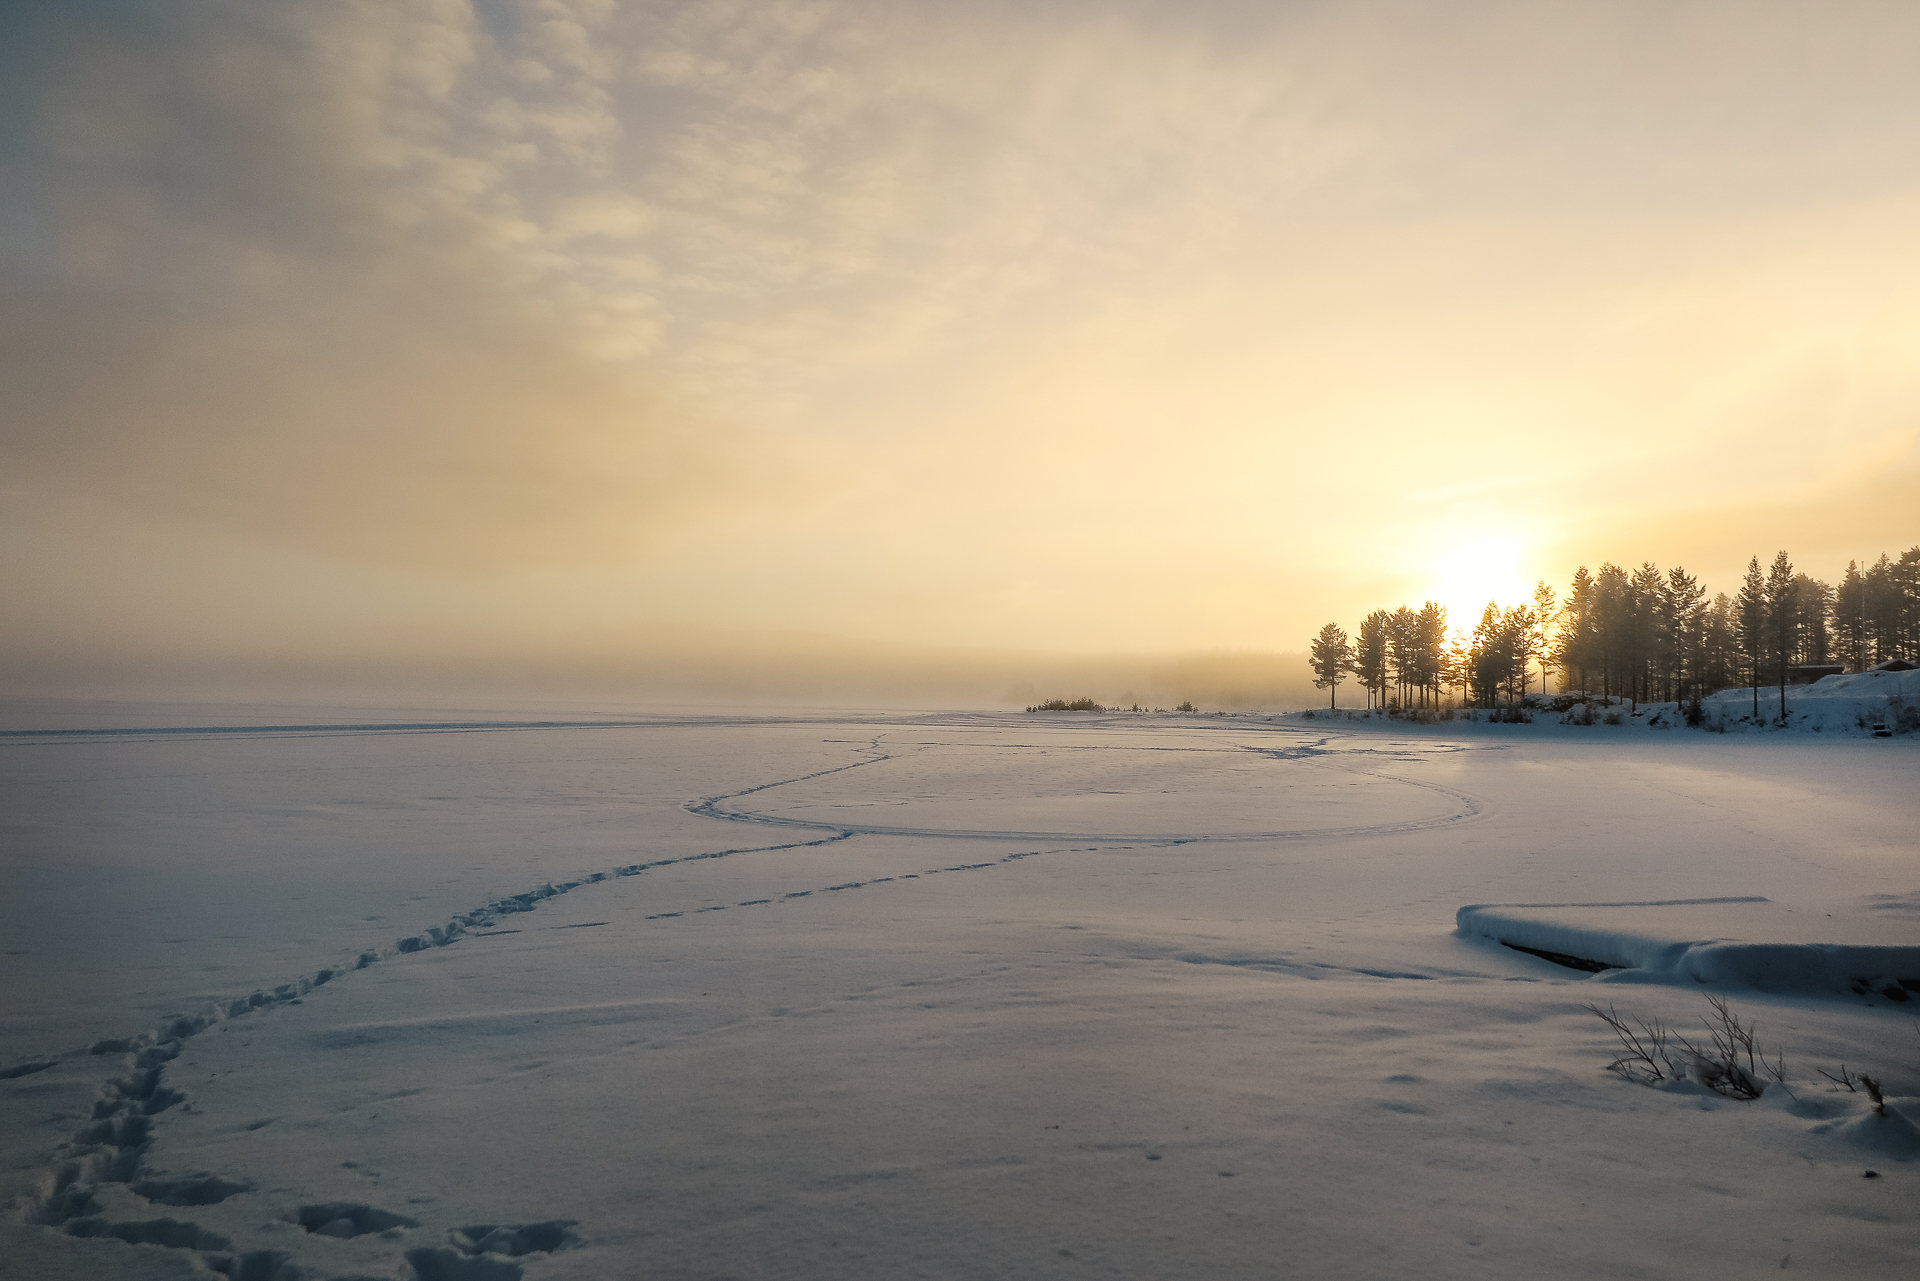 Frihet nordomsjön